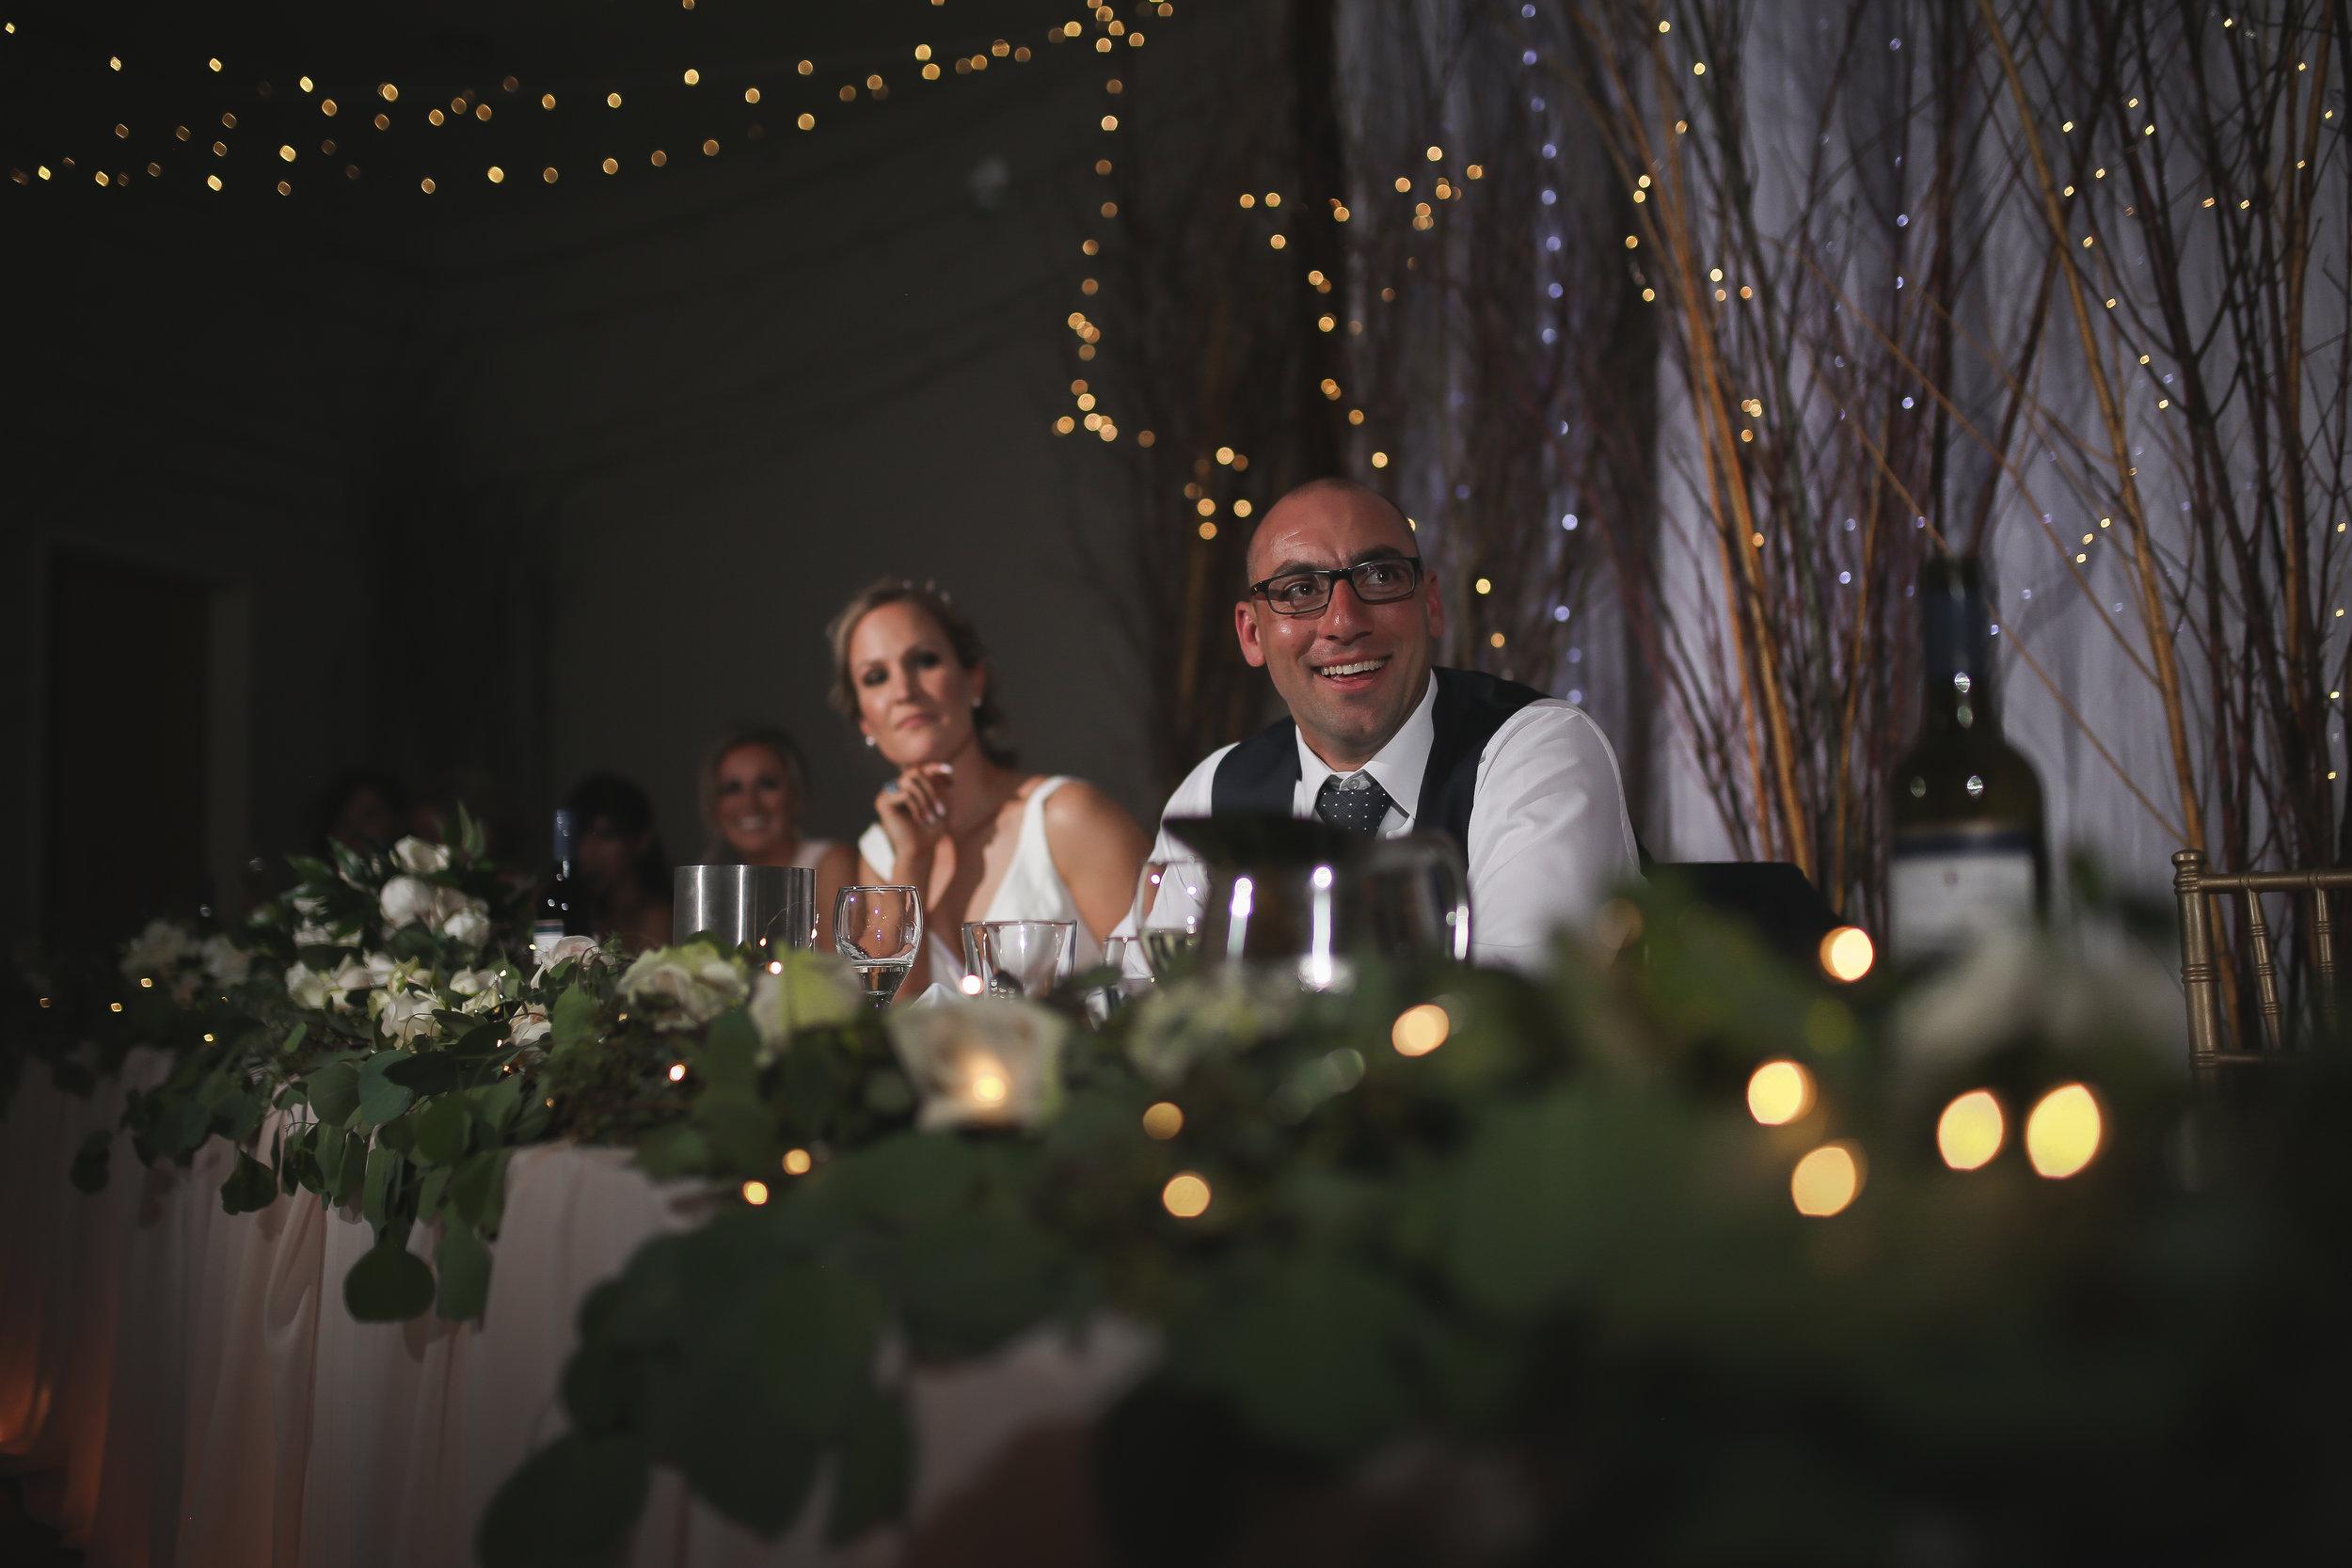 348 Adam Ziorio Photography - Kate & Ben's Wedding.jpg